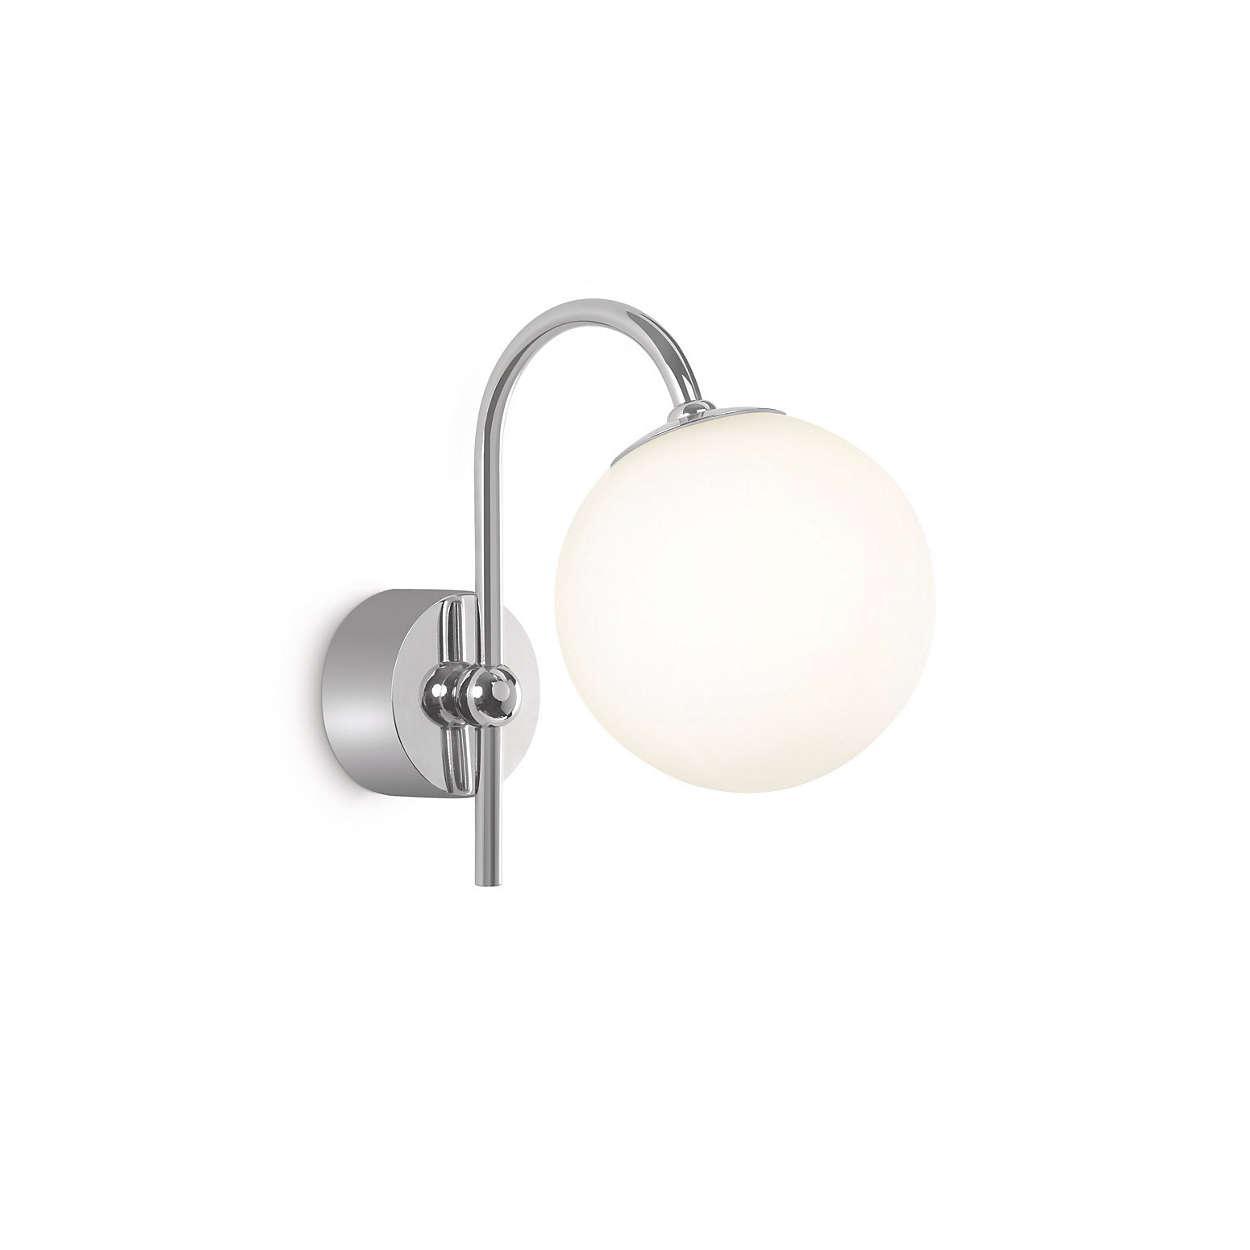 Светильник настенный Silvery chrome 1*42W Philips /340861116/